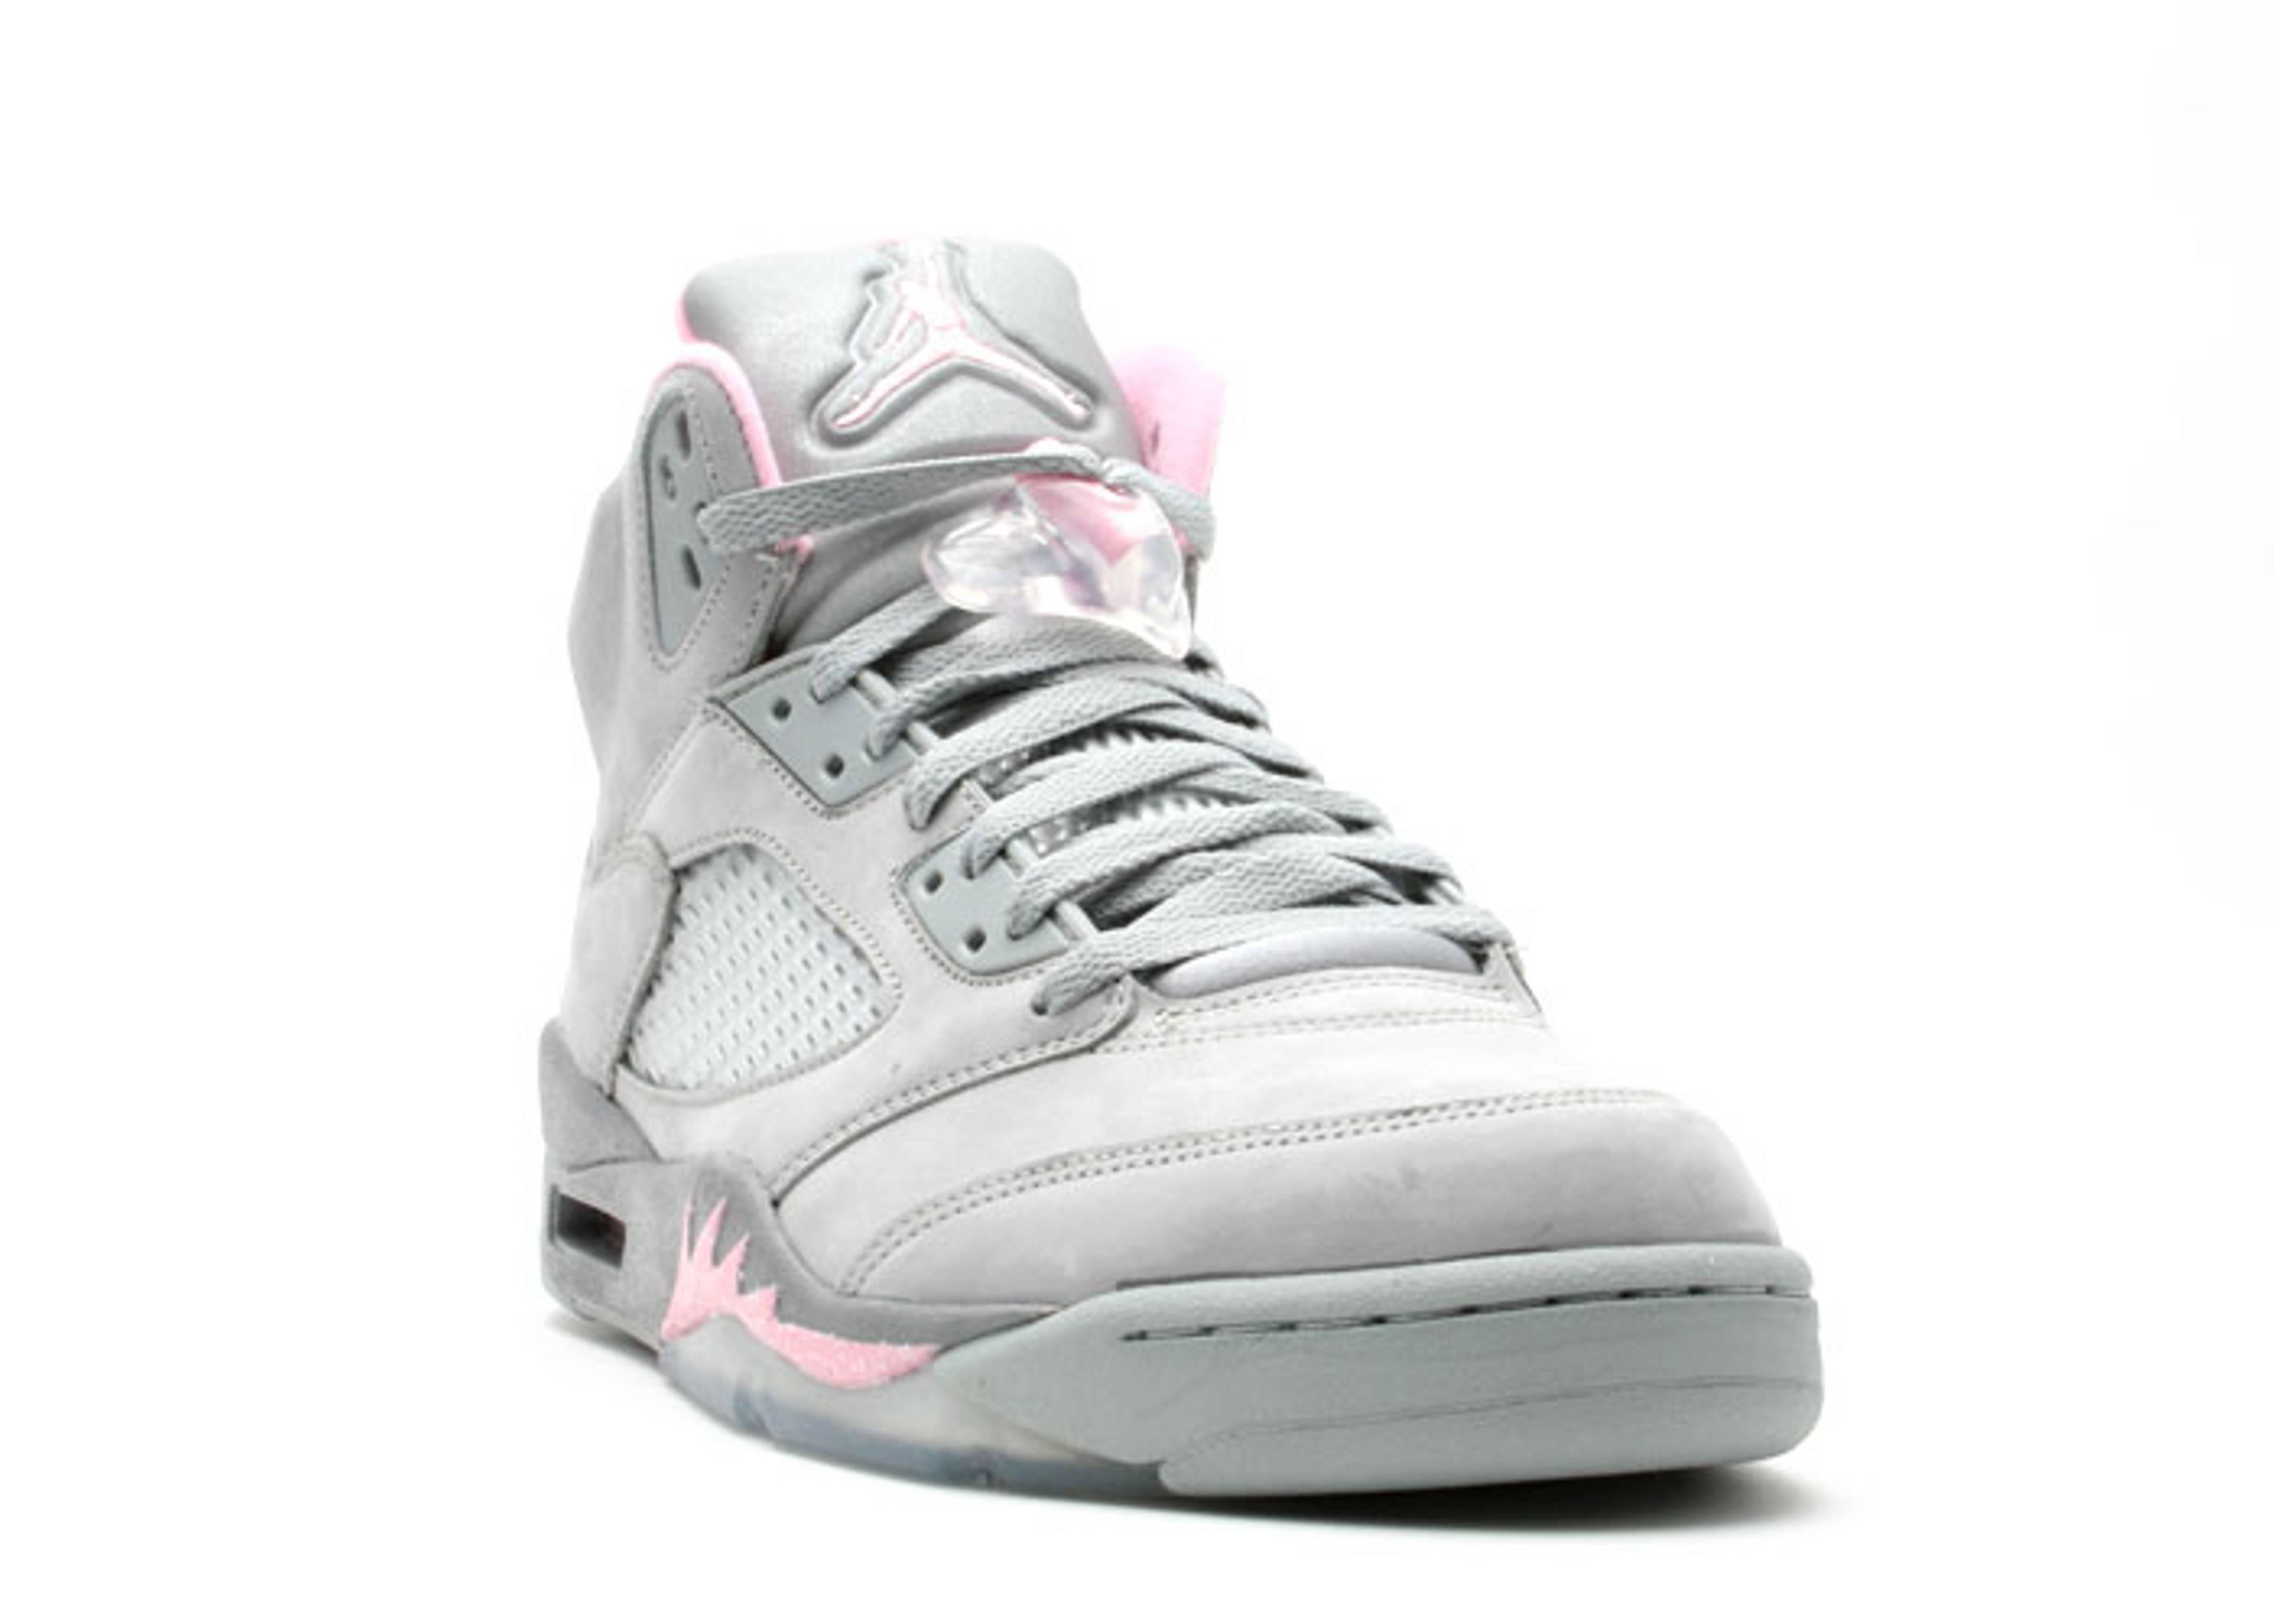 online retailer 7d421 77880 W's Air Jordan 5 Retro